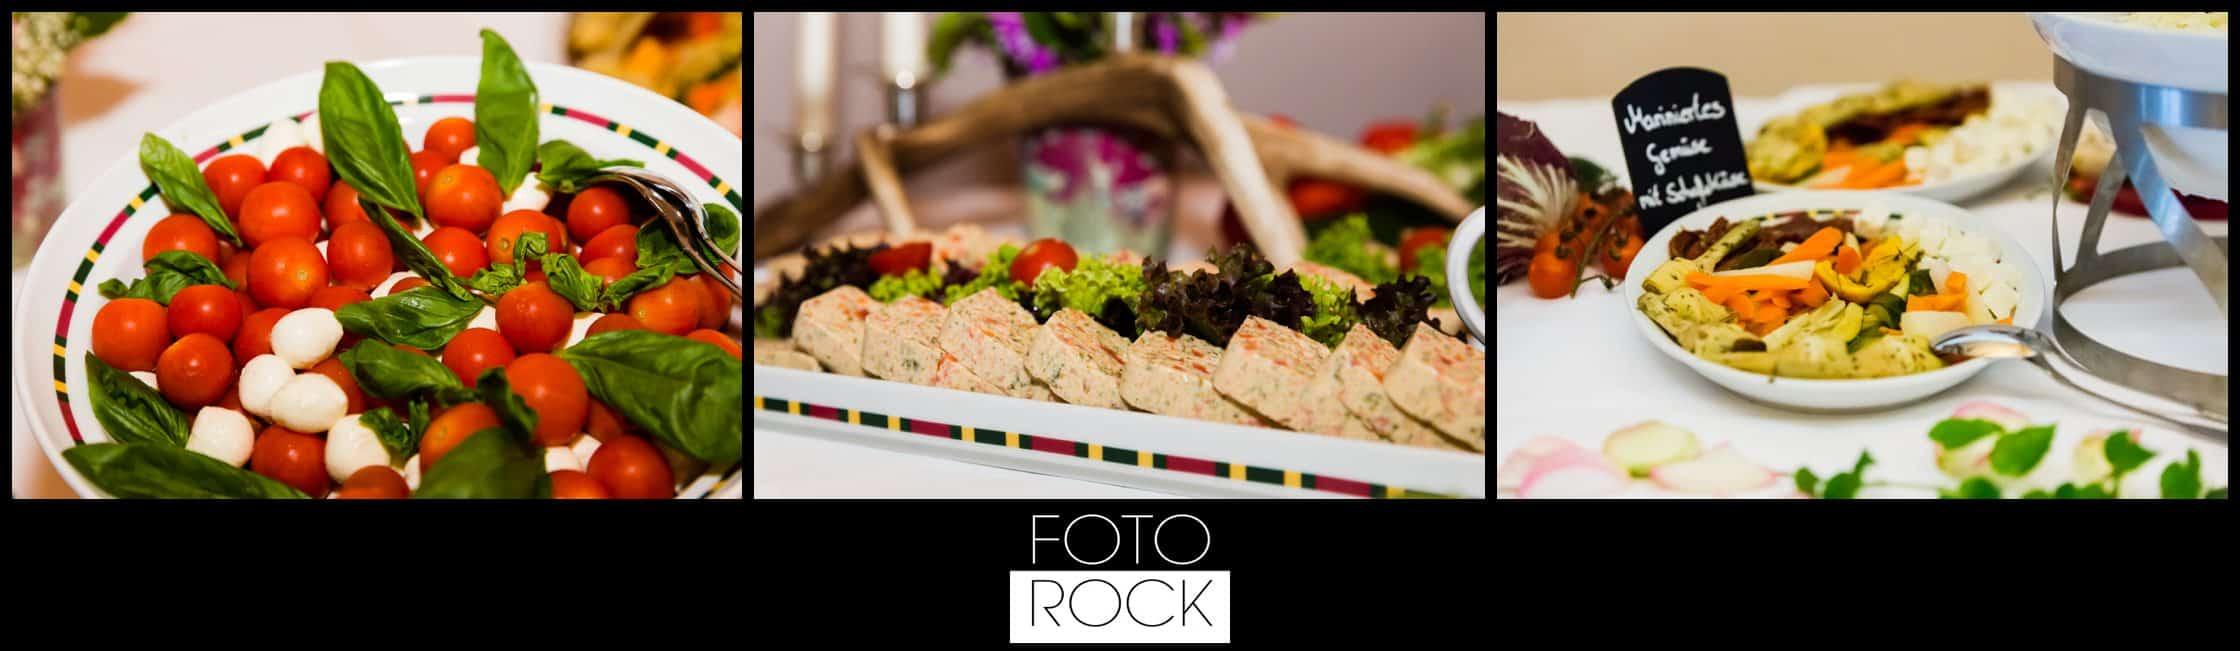 Hochzeit Rafz Albführen Catering Buffet Essen Salat